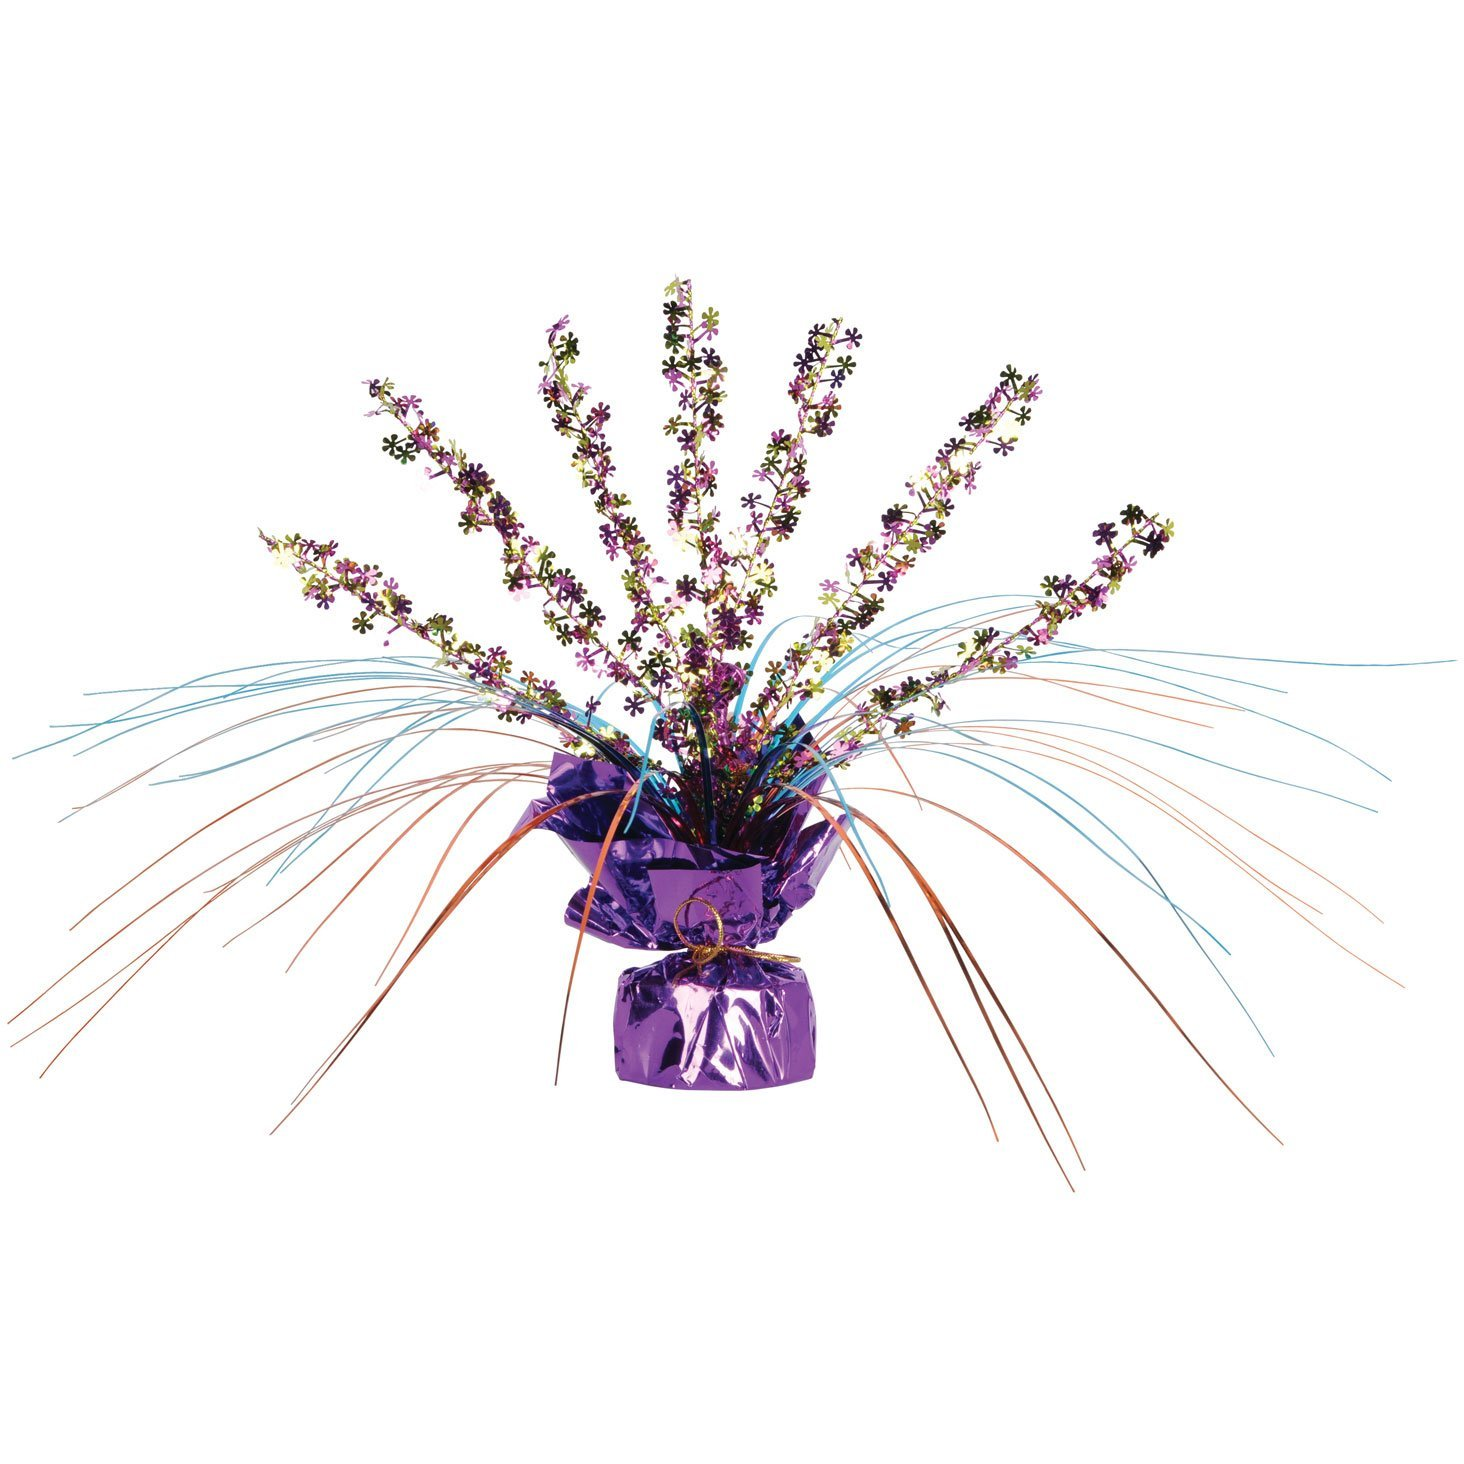 Cheap Centerpiece Flowers Find Centerpiece Flowers Deals On Line At